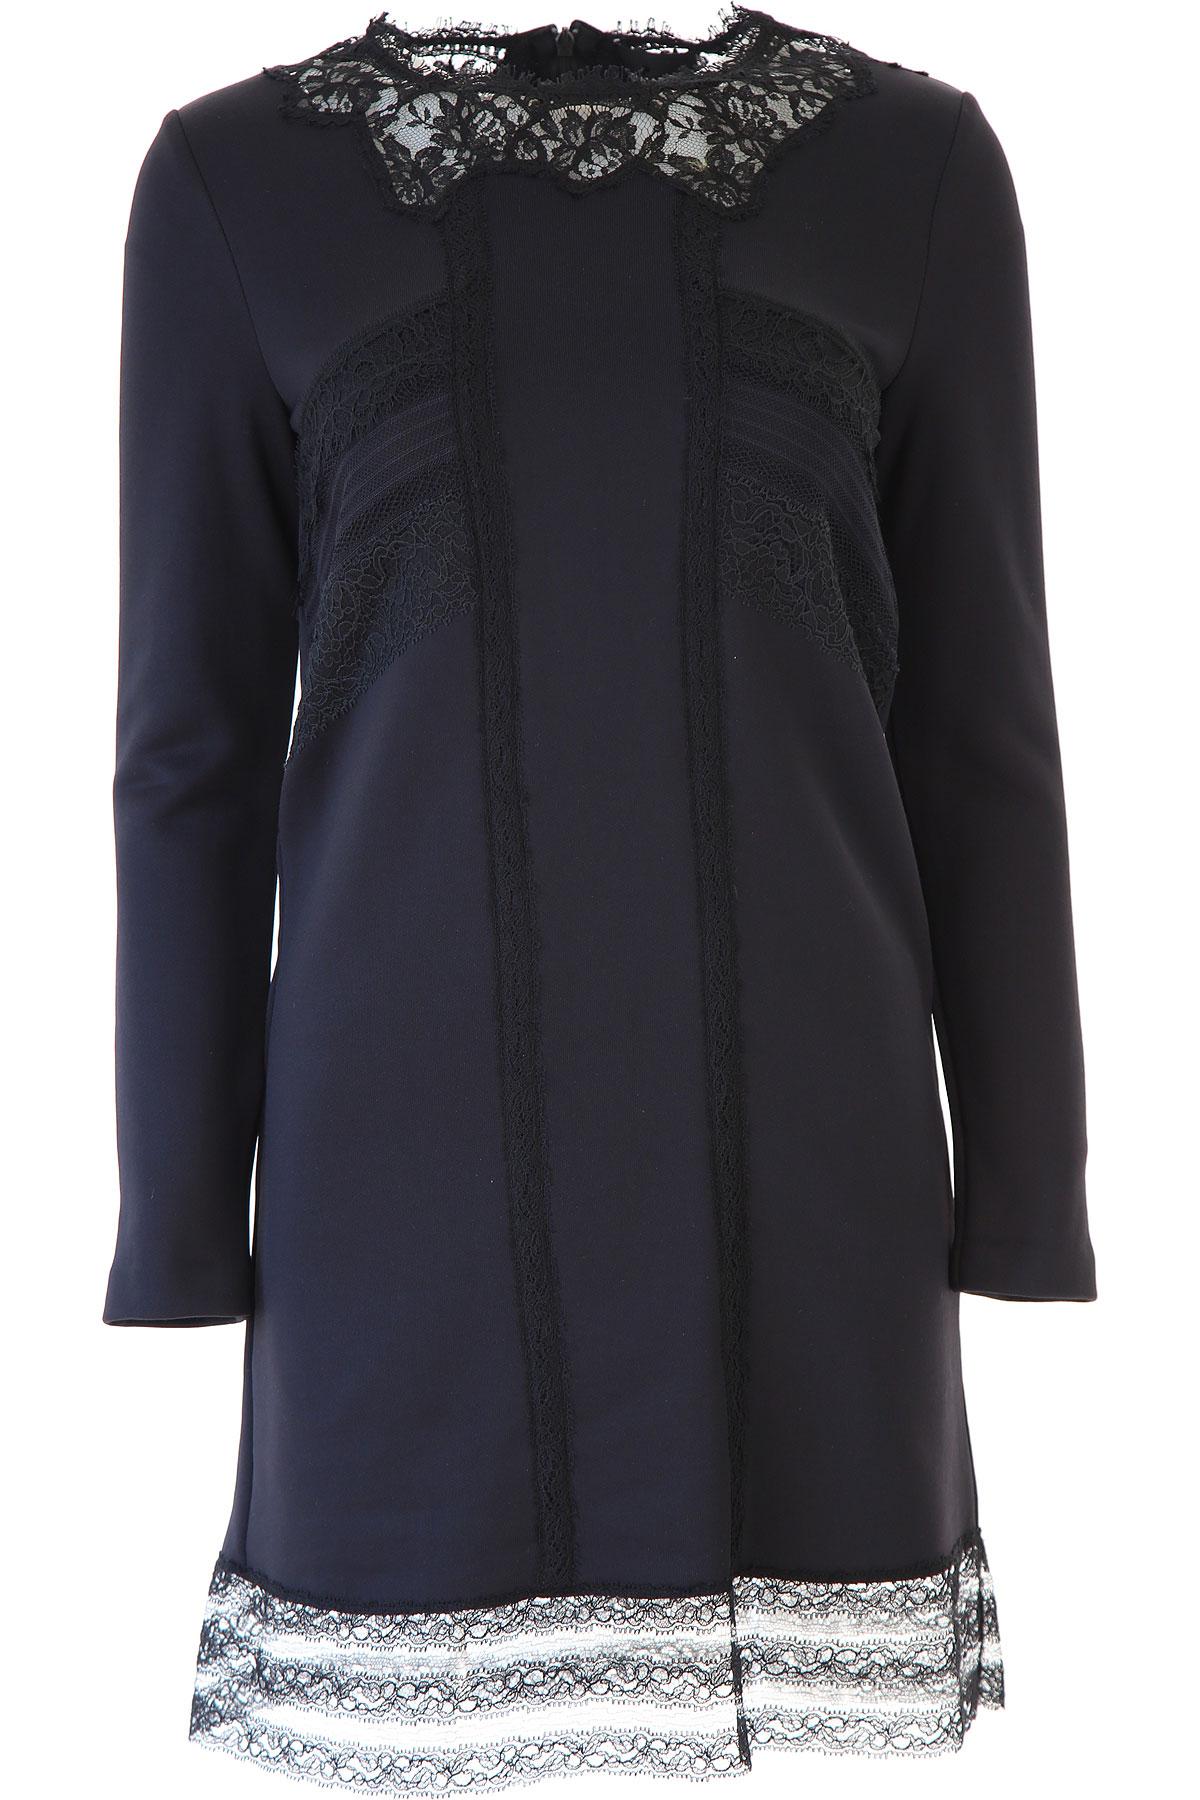 Ermanno Scervino Dress for Women, Evening Cocktail Party On Sale, Black, Viscose, 2019, 4 6